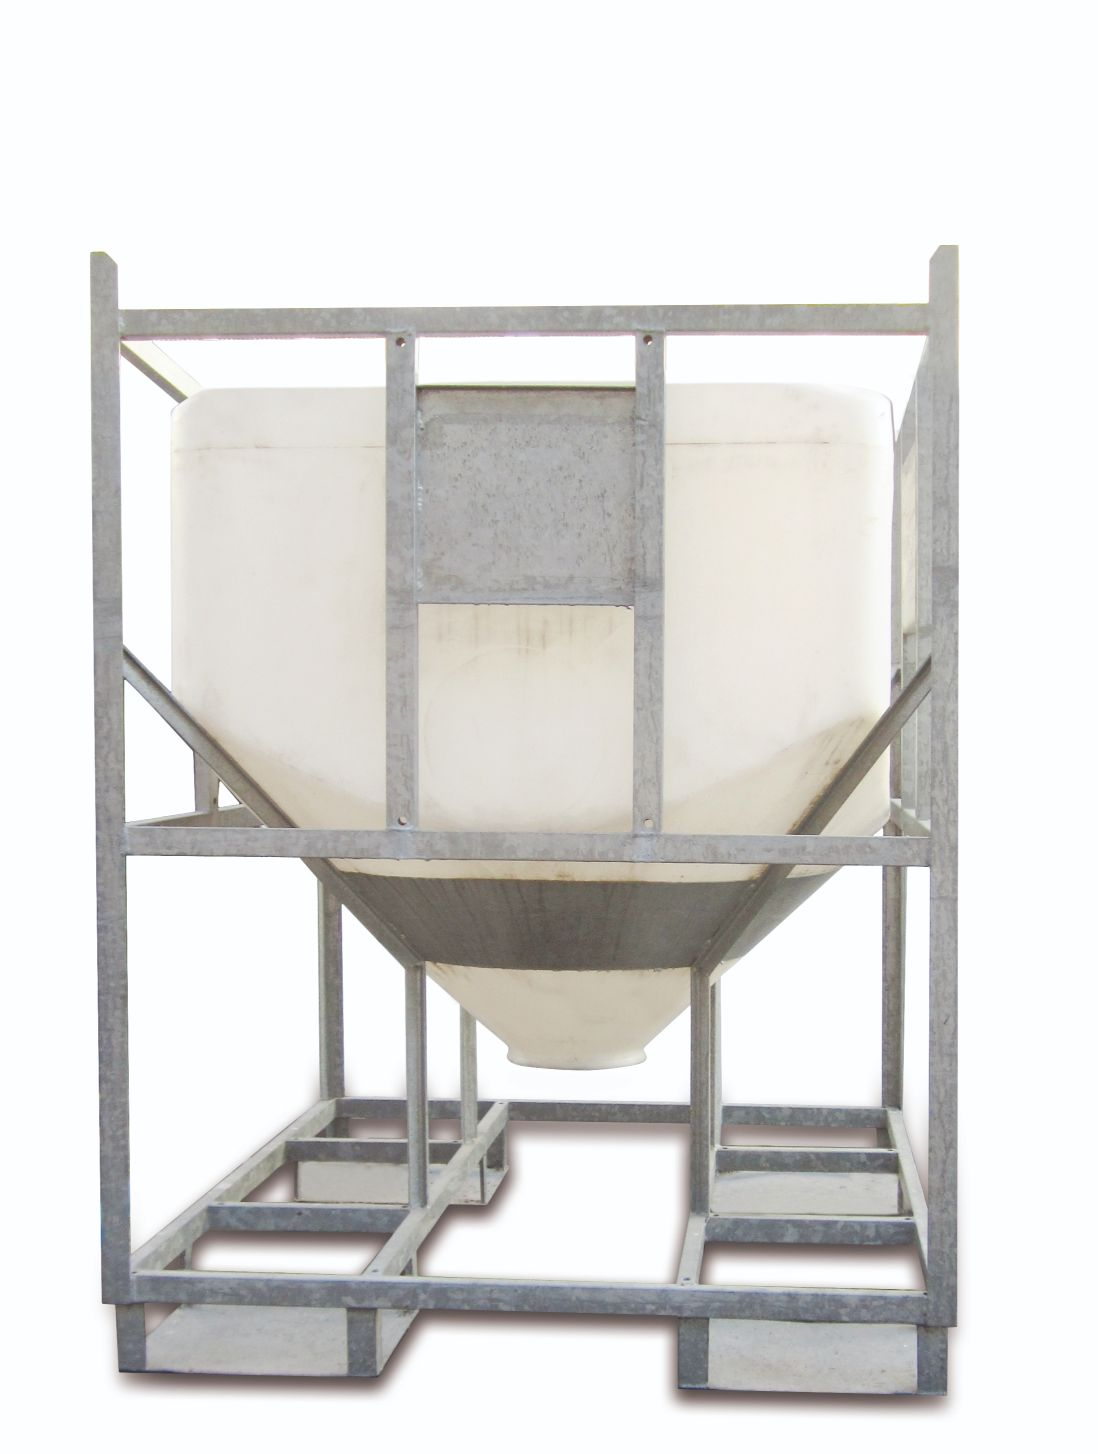 Bac doseur – Type silo transportable